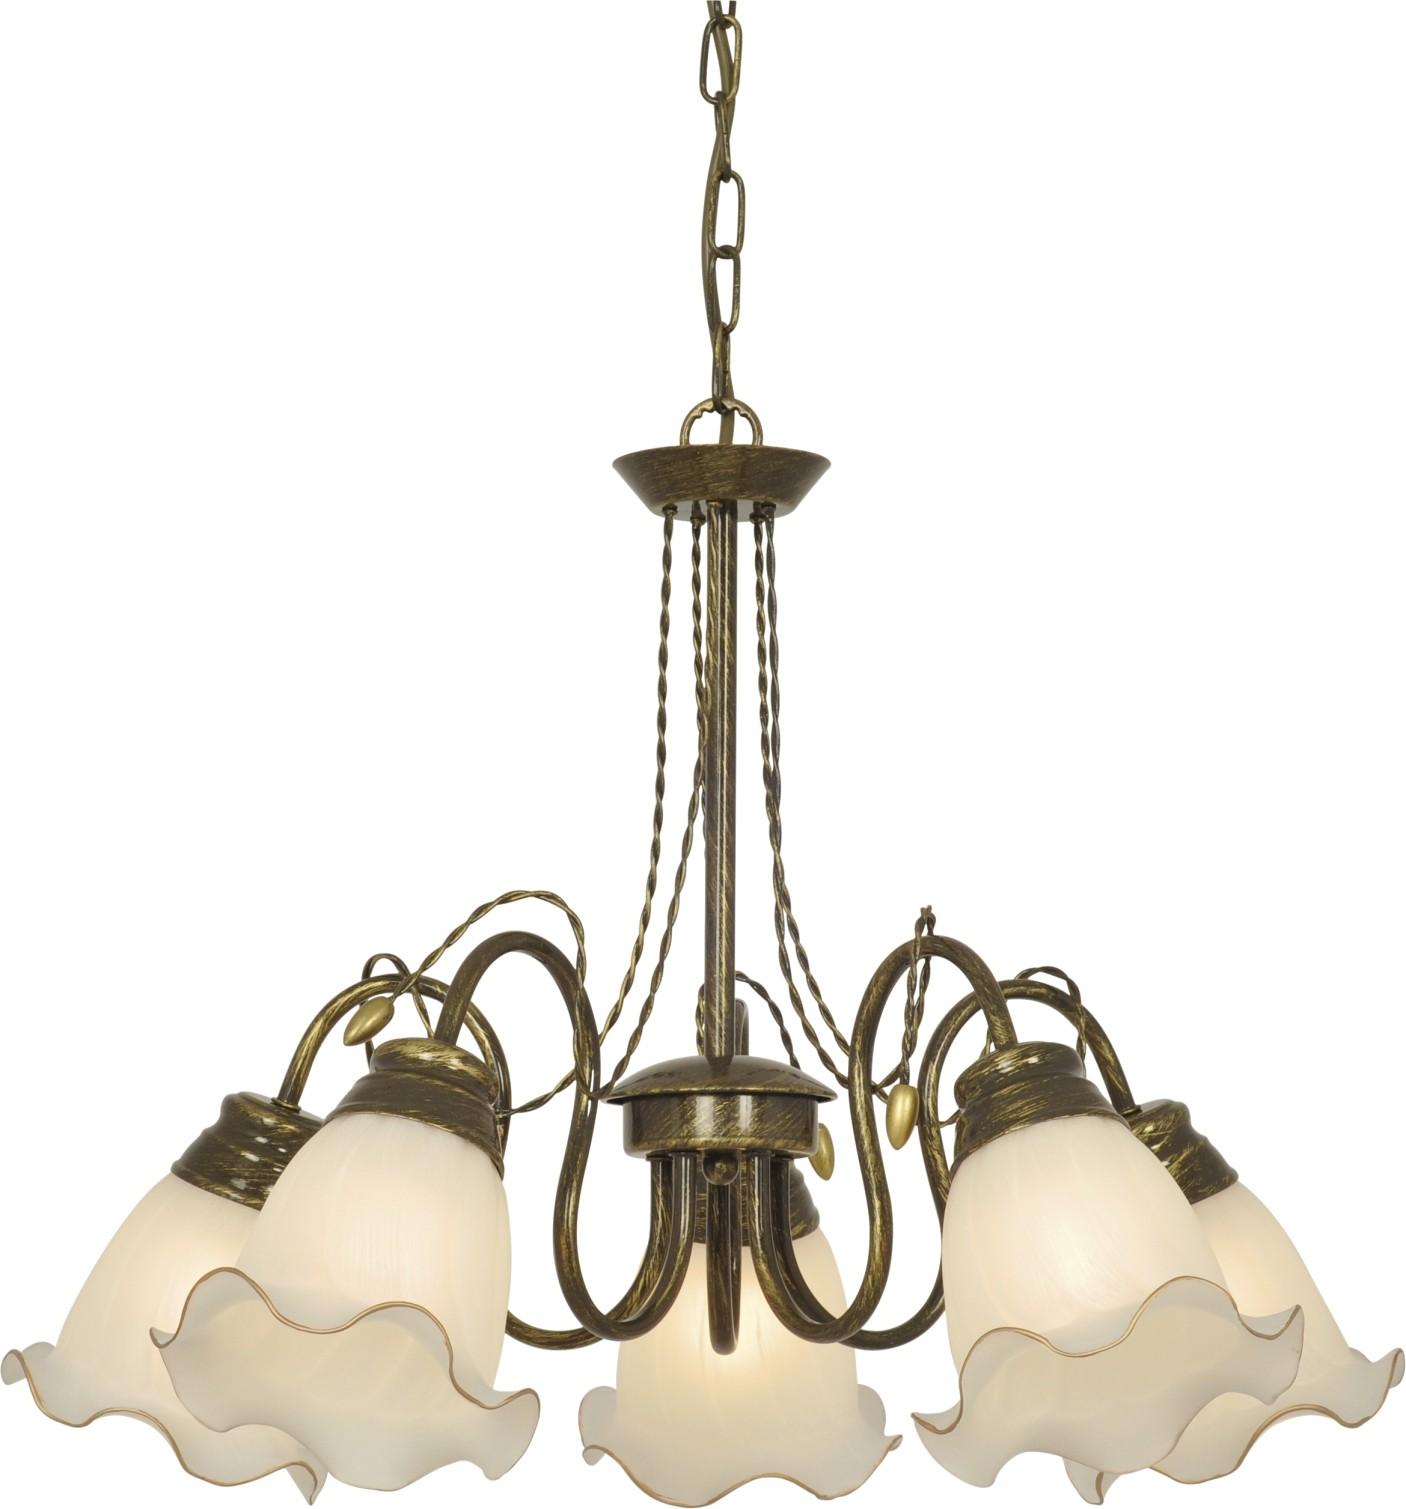 dedeman berta lustra 5xe14 kl 7246 lustre lustre si candelabre iluminat de interior. Black Bedroom Furniture Sets. Home Design Ideas